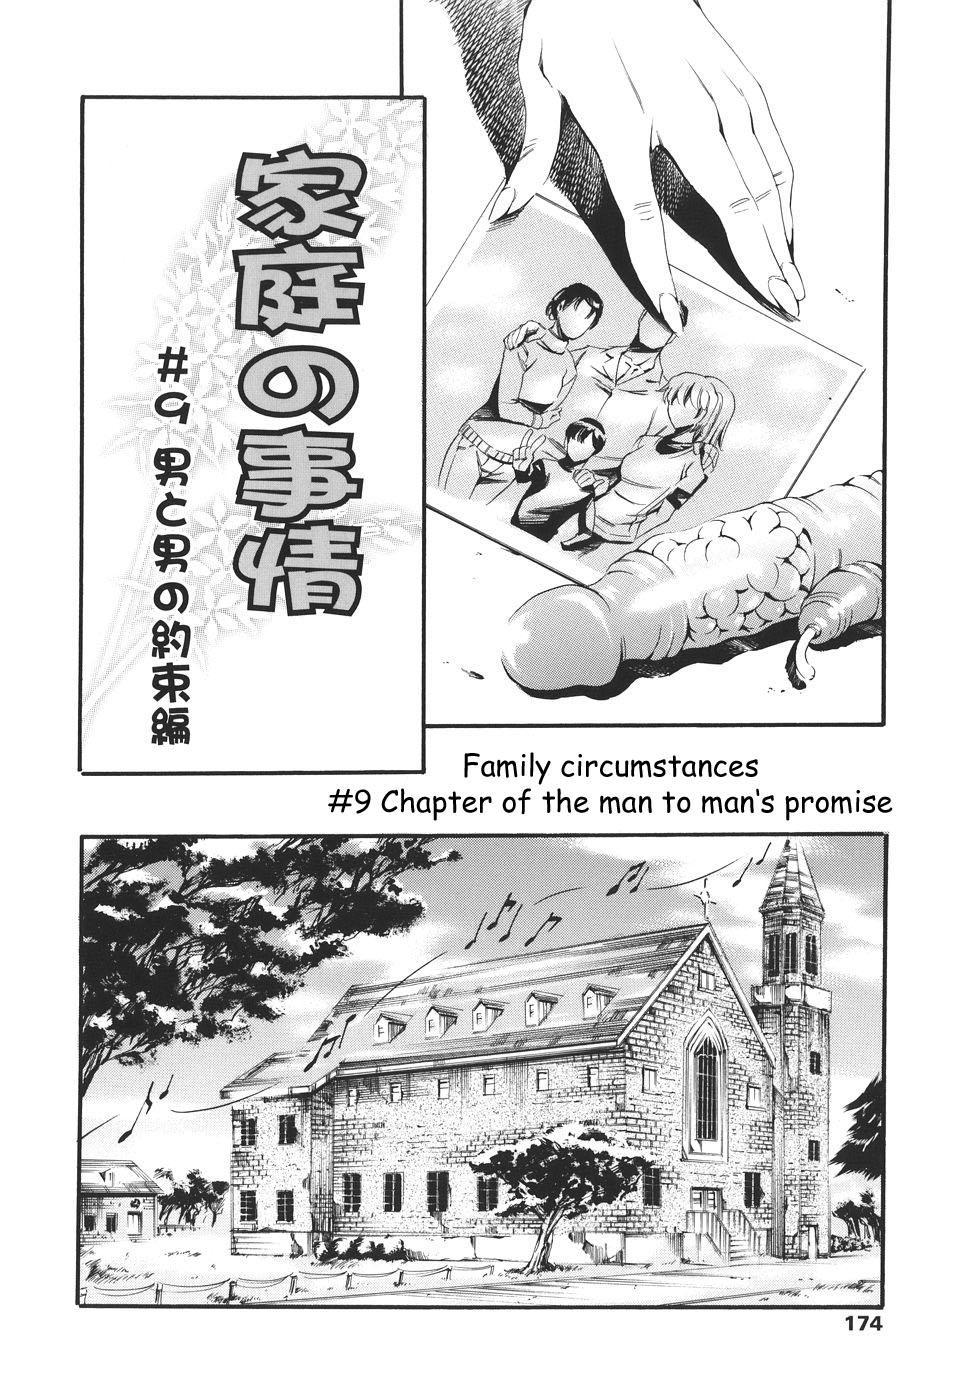 Katei no Jijou - Family's circumstances 166